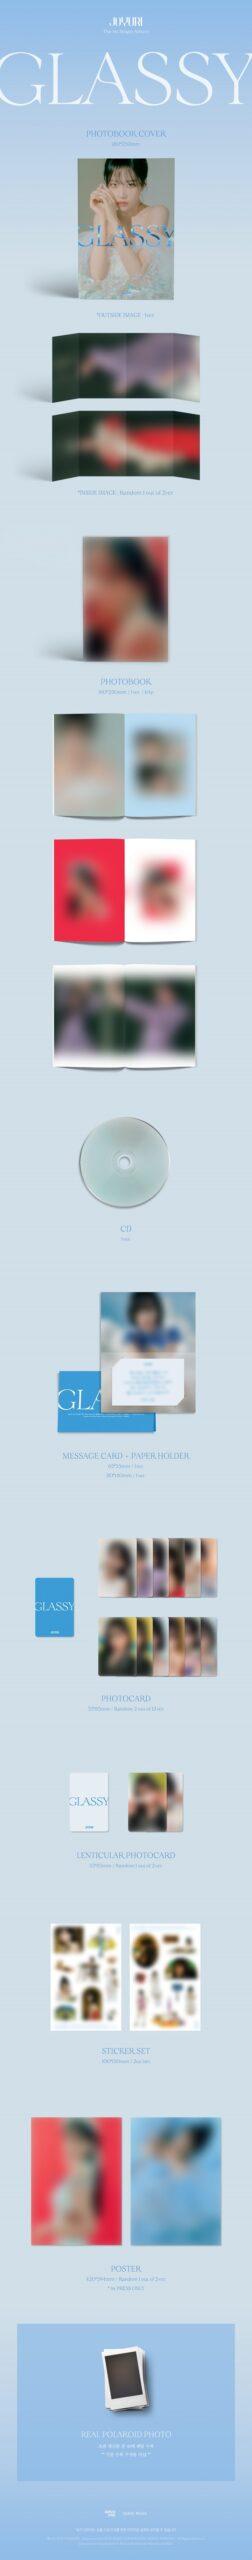 1st JO YURI Single Album GLASSY